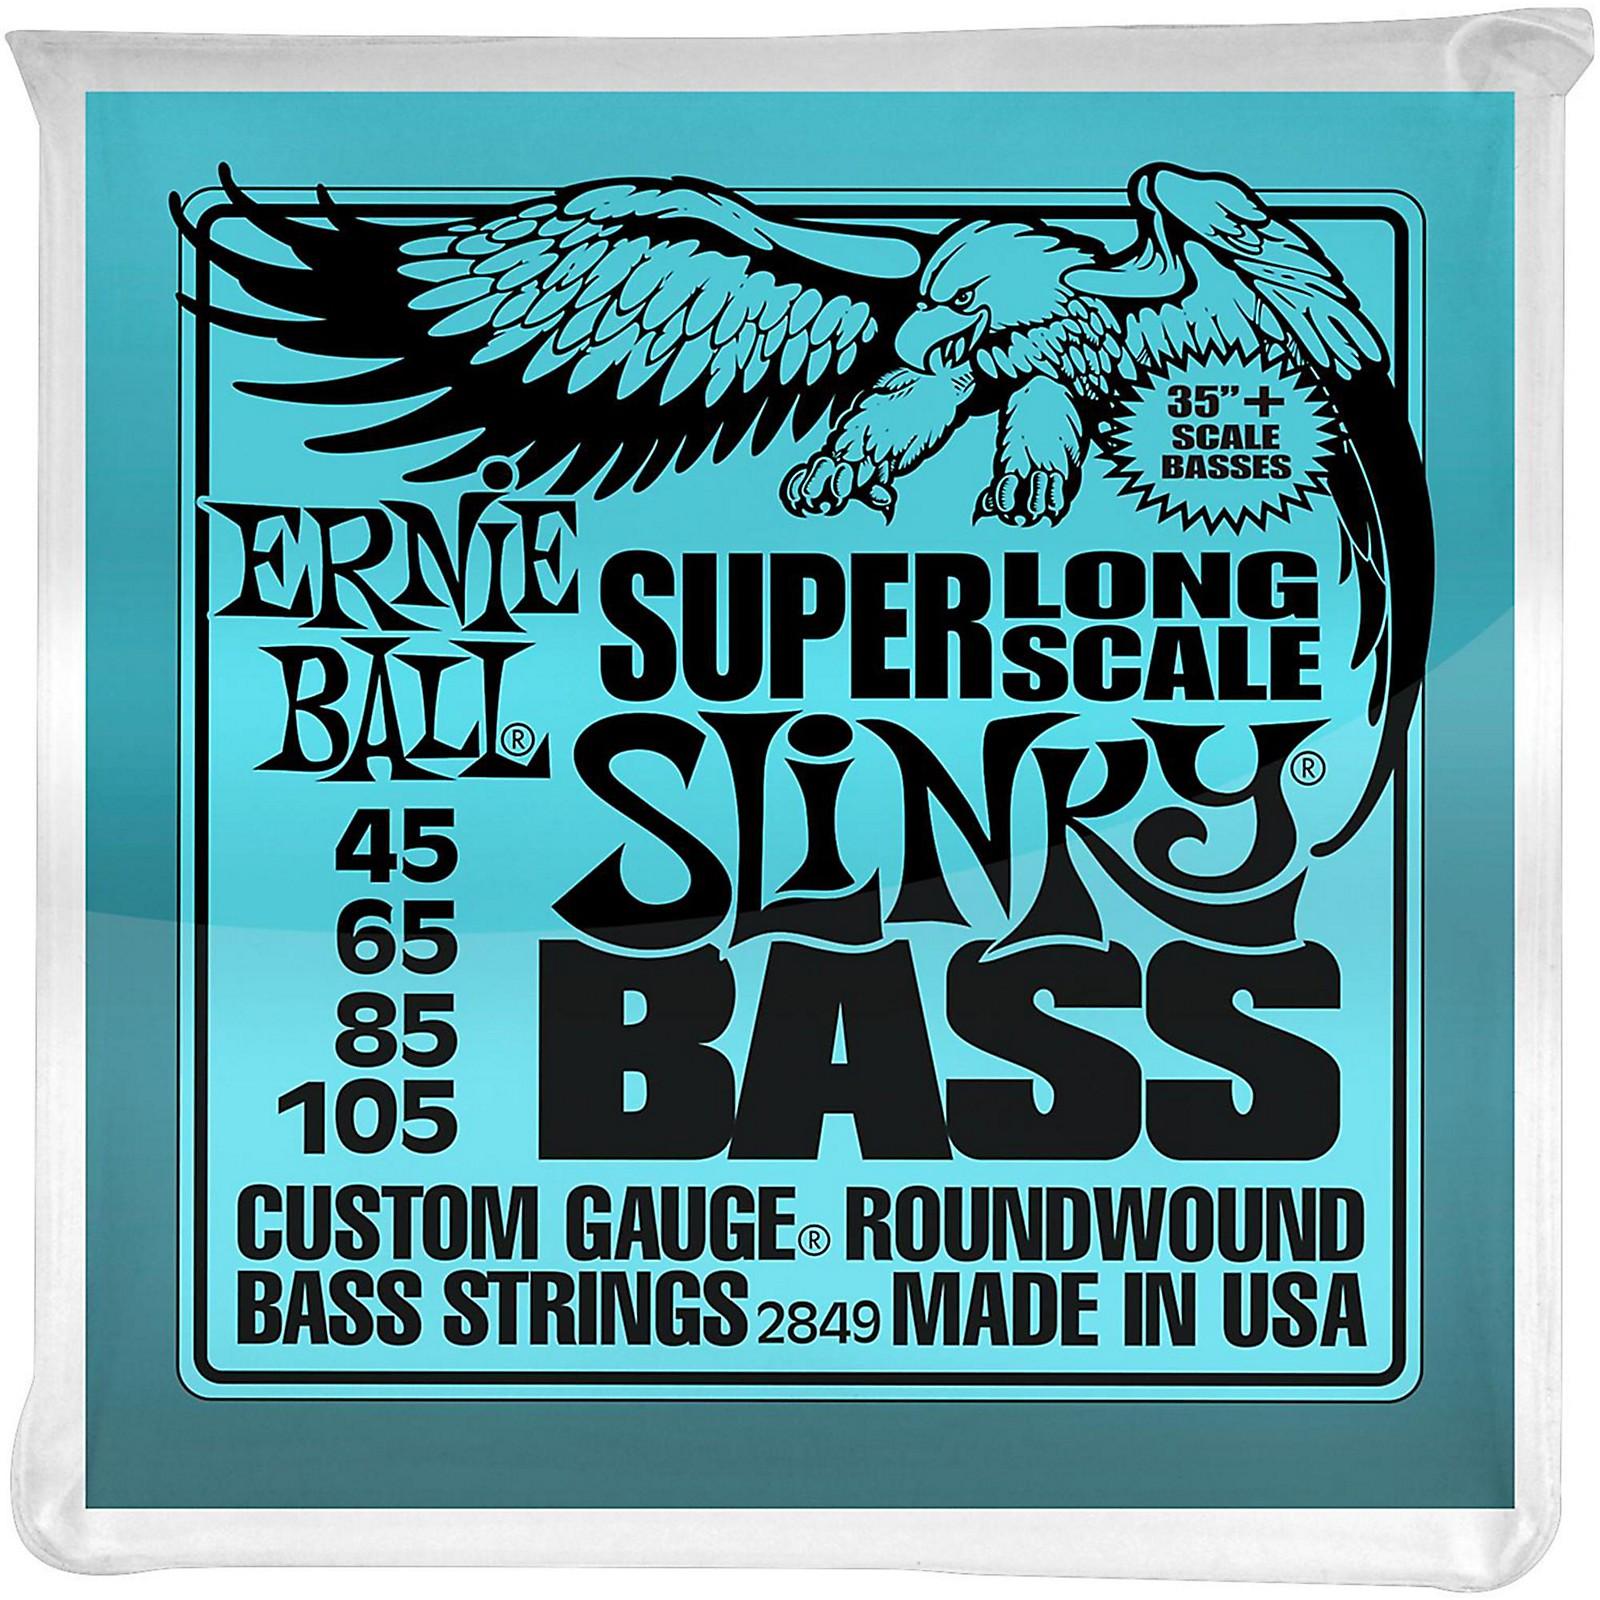 Ernie Ball Hybrid Slinky Bass Strings Super Long Scale